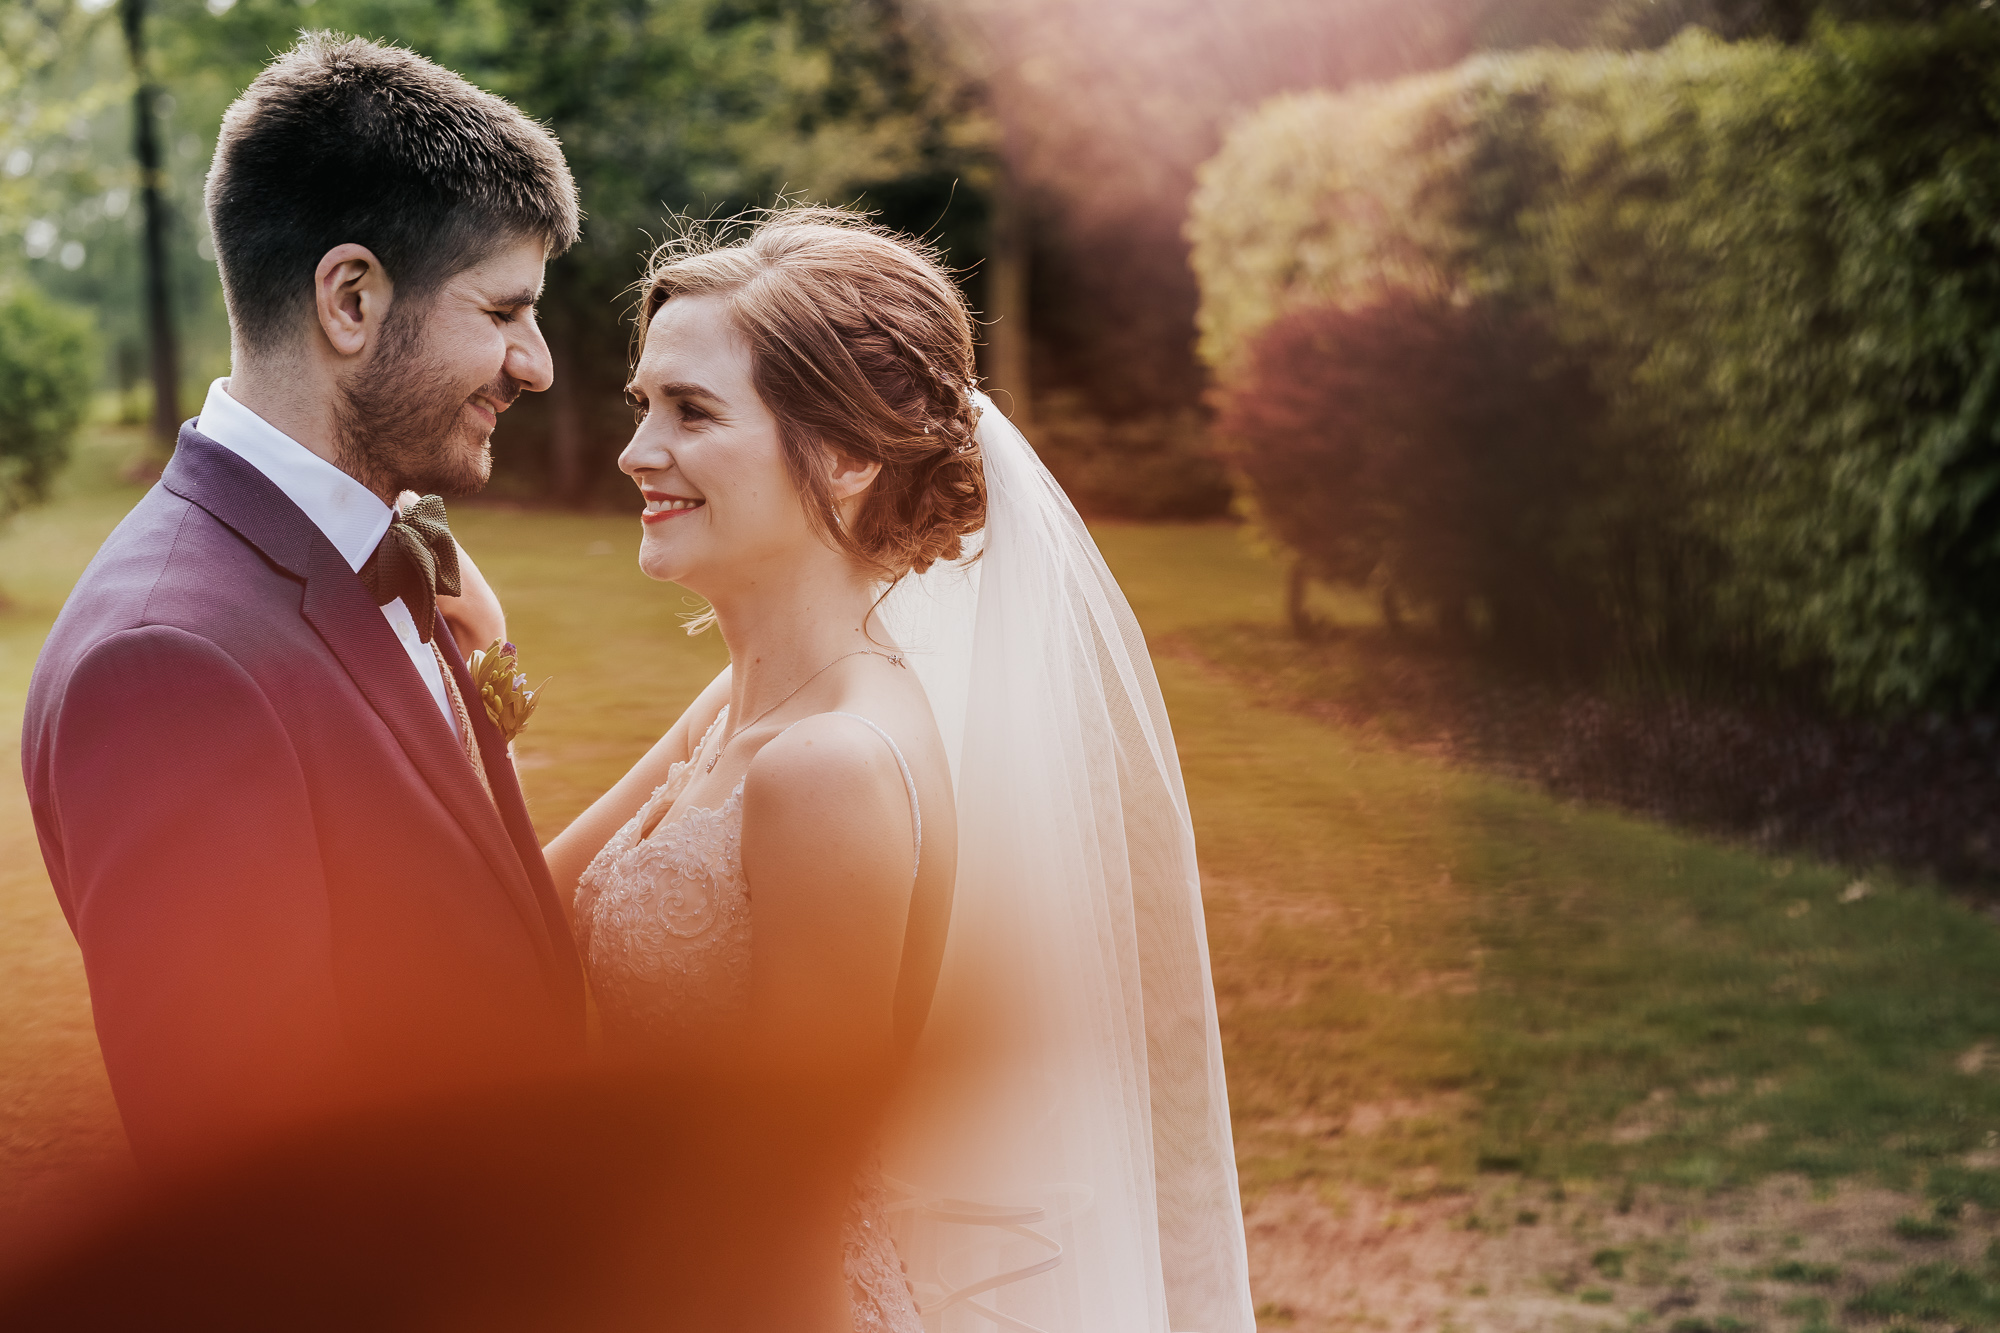 Nunsmere Hall Hotel Wedding photograhpy in cheshire wedding photographer (27 of 42).jpg